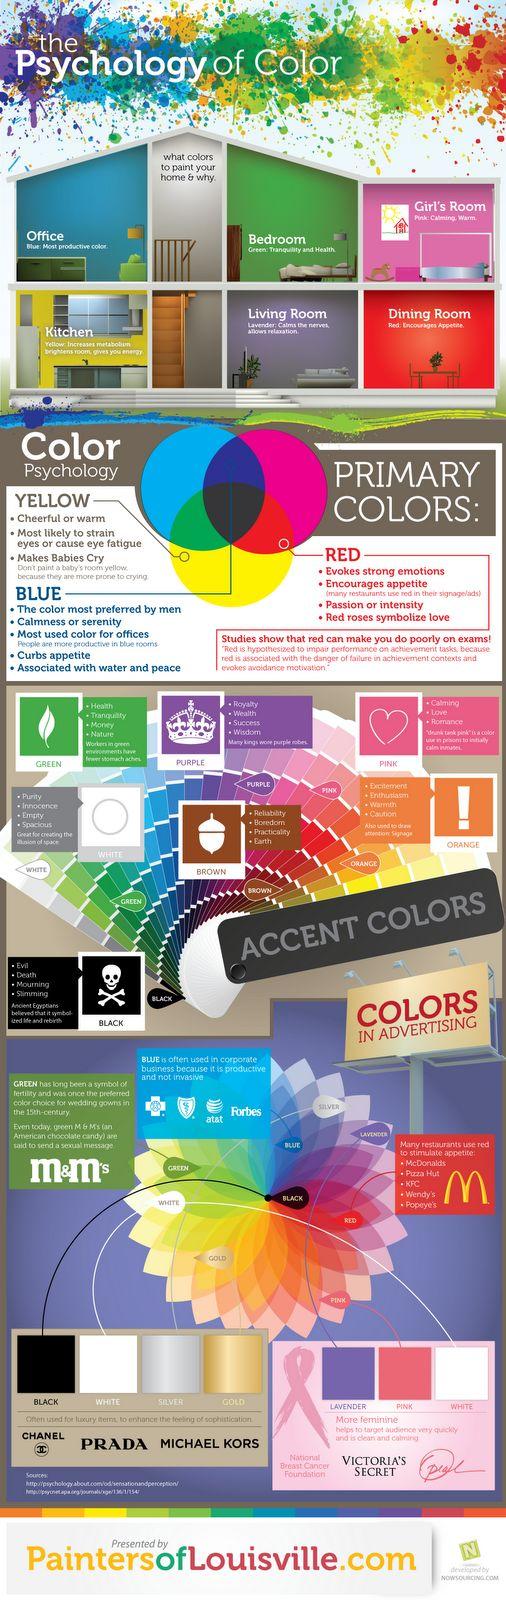 68 best Info que me interesa images on Pinterest | Digital marketing ...